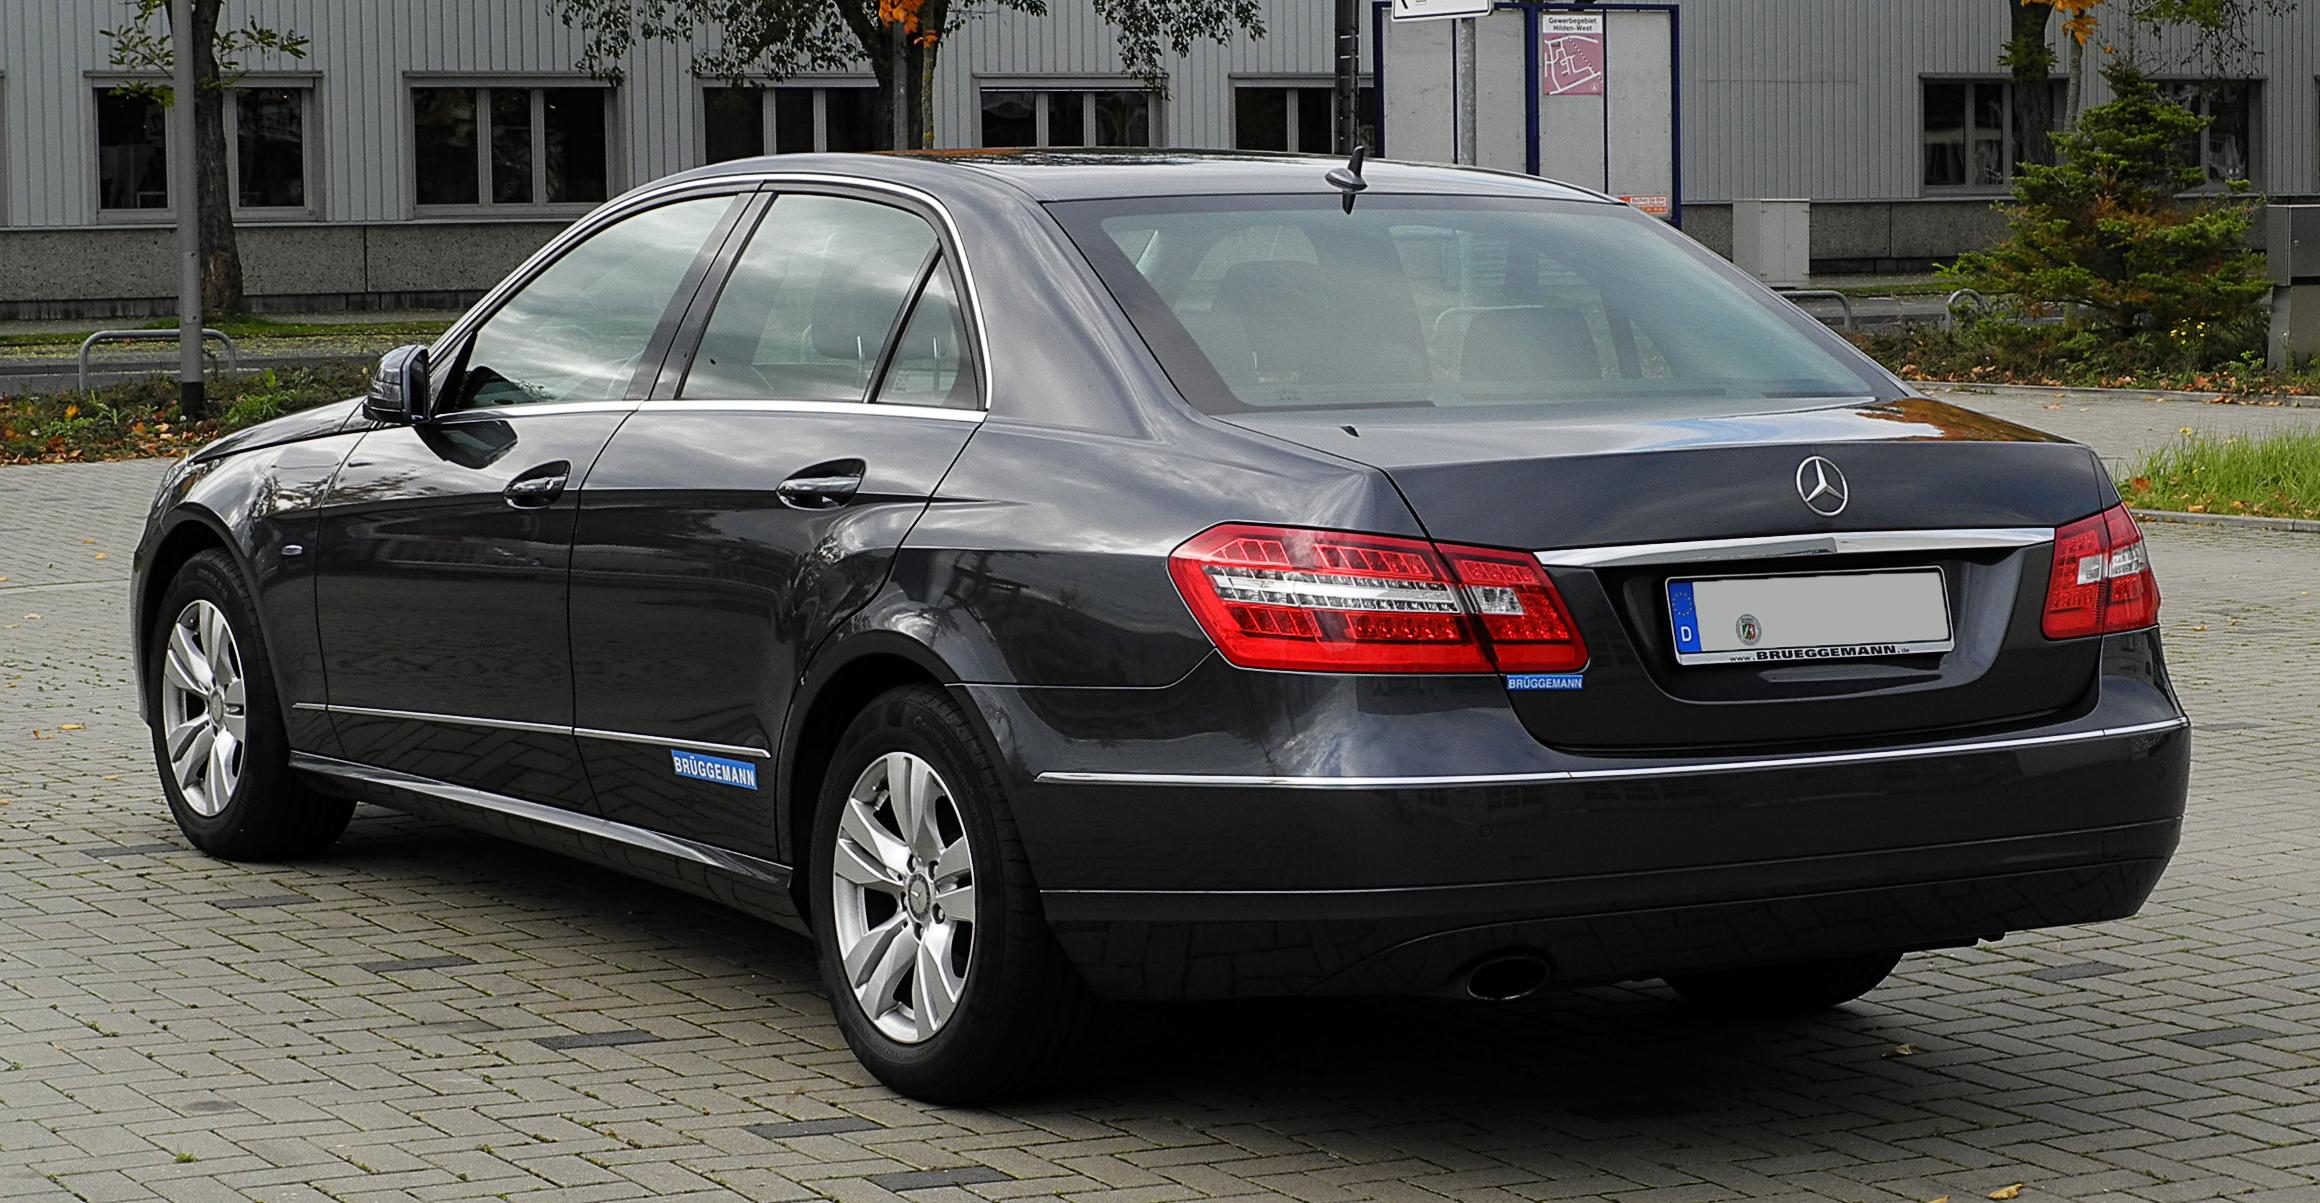 File Mercedes Benz E 200 CGI BlueEFFICINECY Avantgarde  W 212   E2 80 93 Heckansicht  29  Oktober 2011  Hilden in addition 10271997185 likewise 11 in addition 8222436749 as well Watch. on 2013 mercedes benz e350